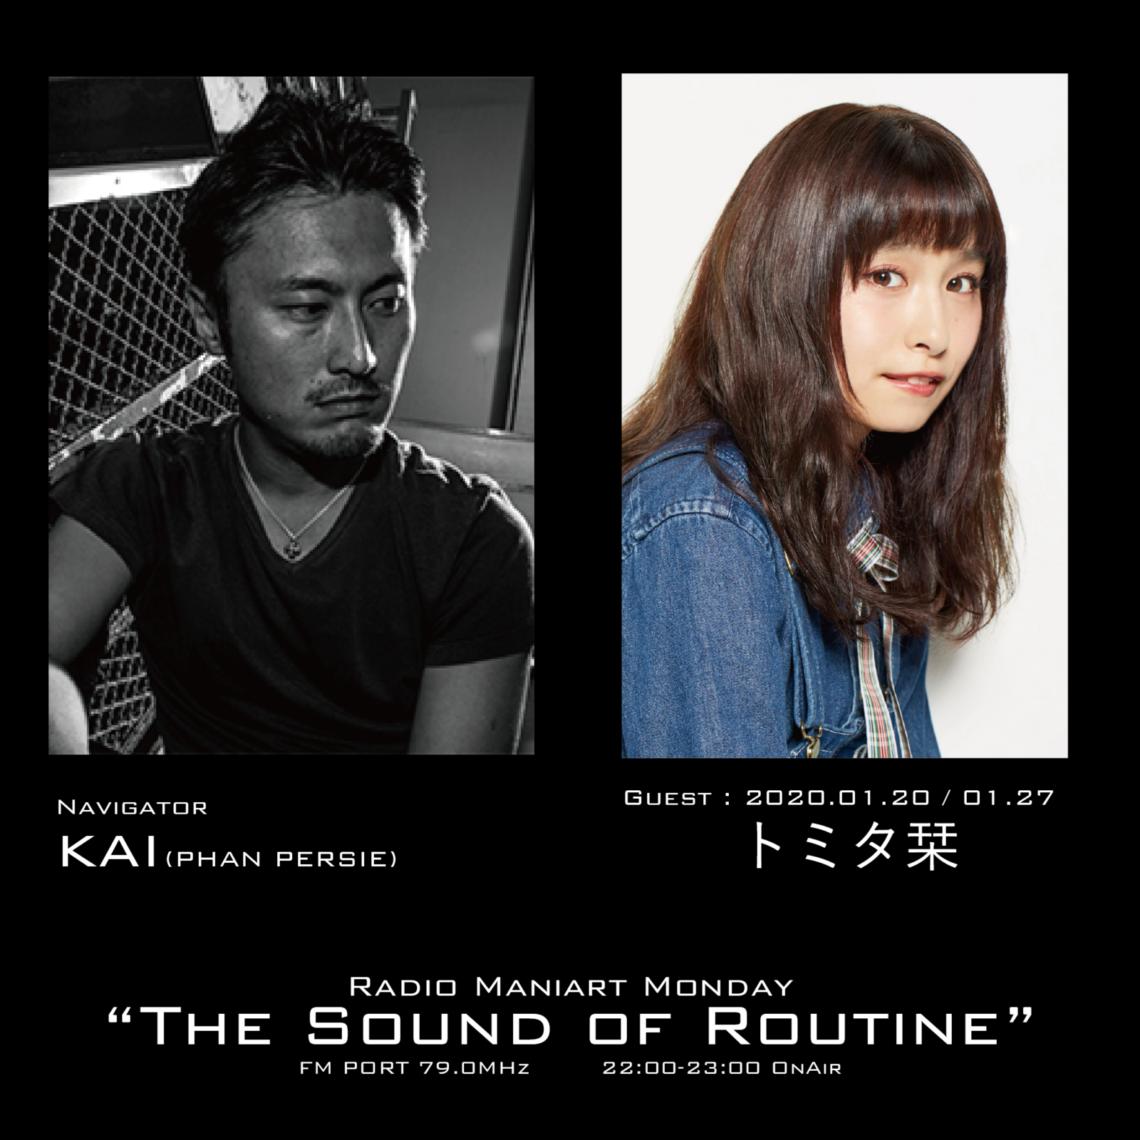 2020. 1. 20 MON, 1. 27 MON – KAI : Navigator on FM PORT / the Sound of Routine – Guest : トミタ栞